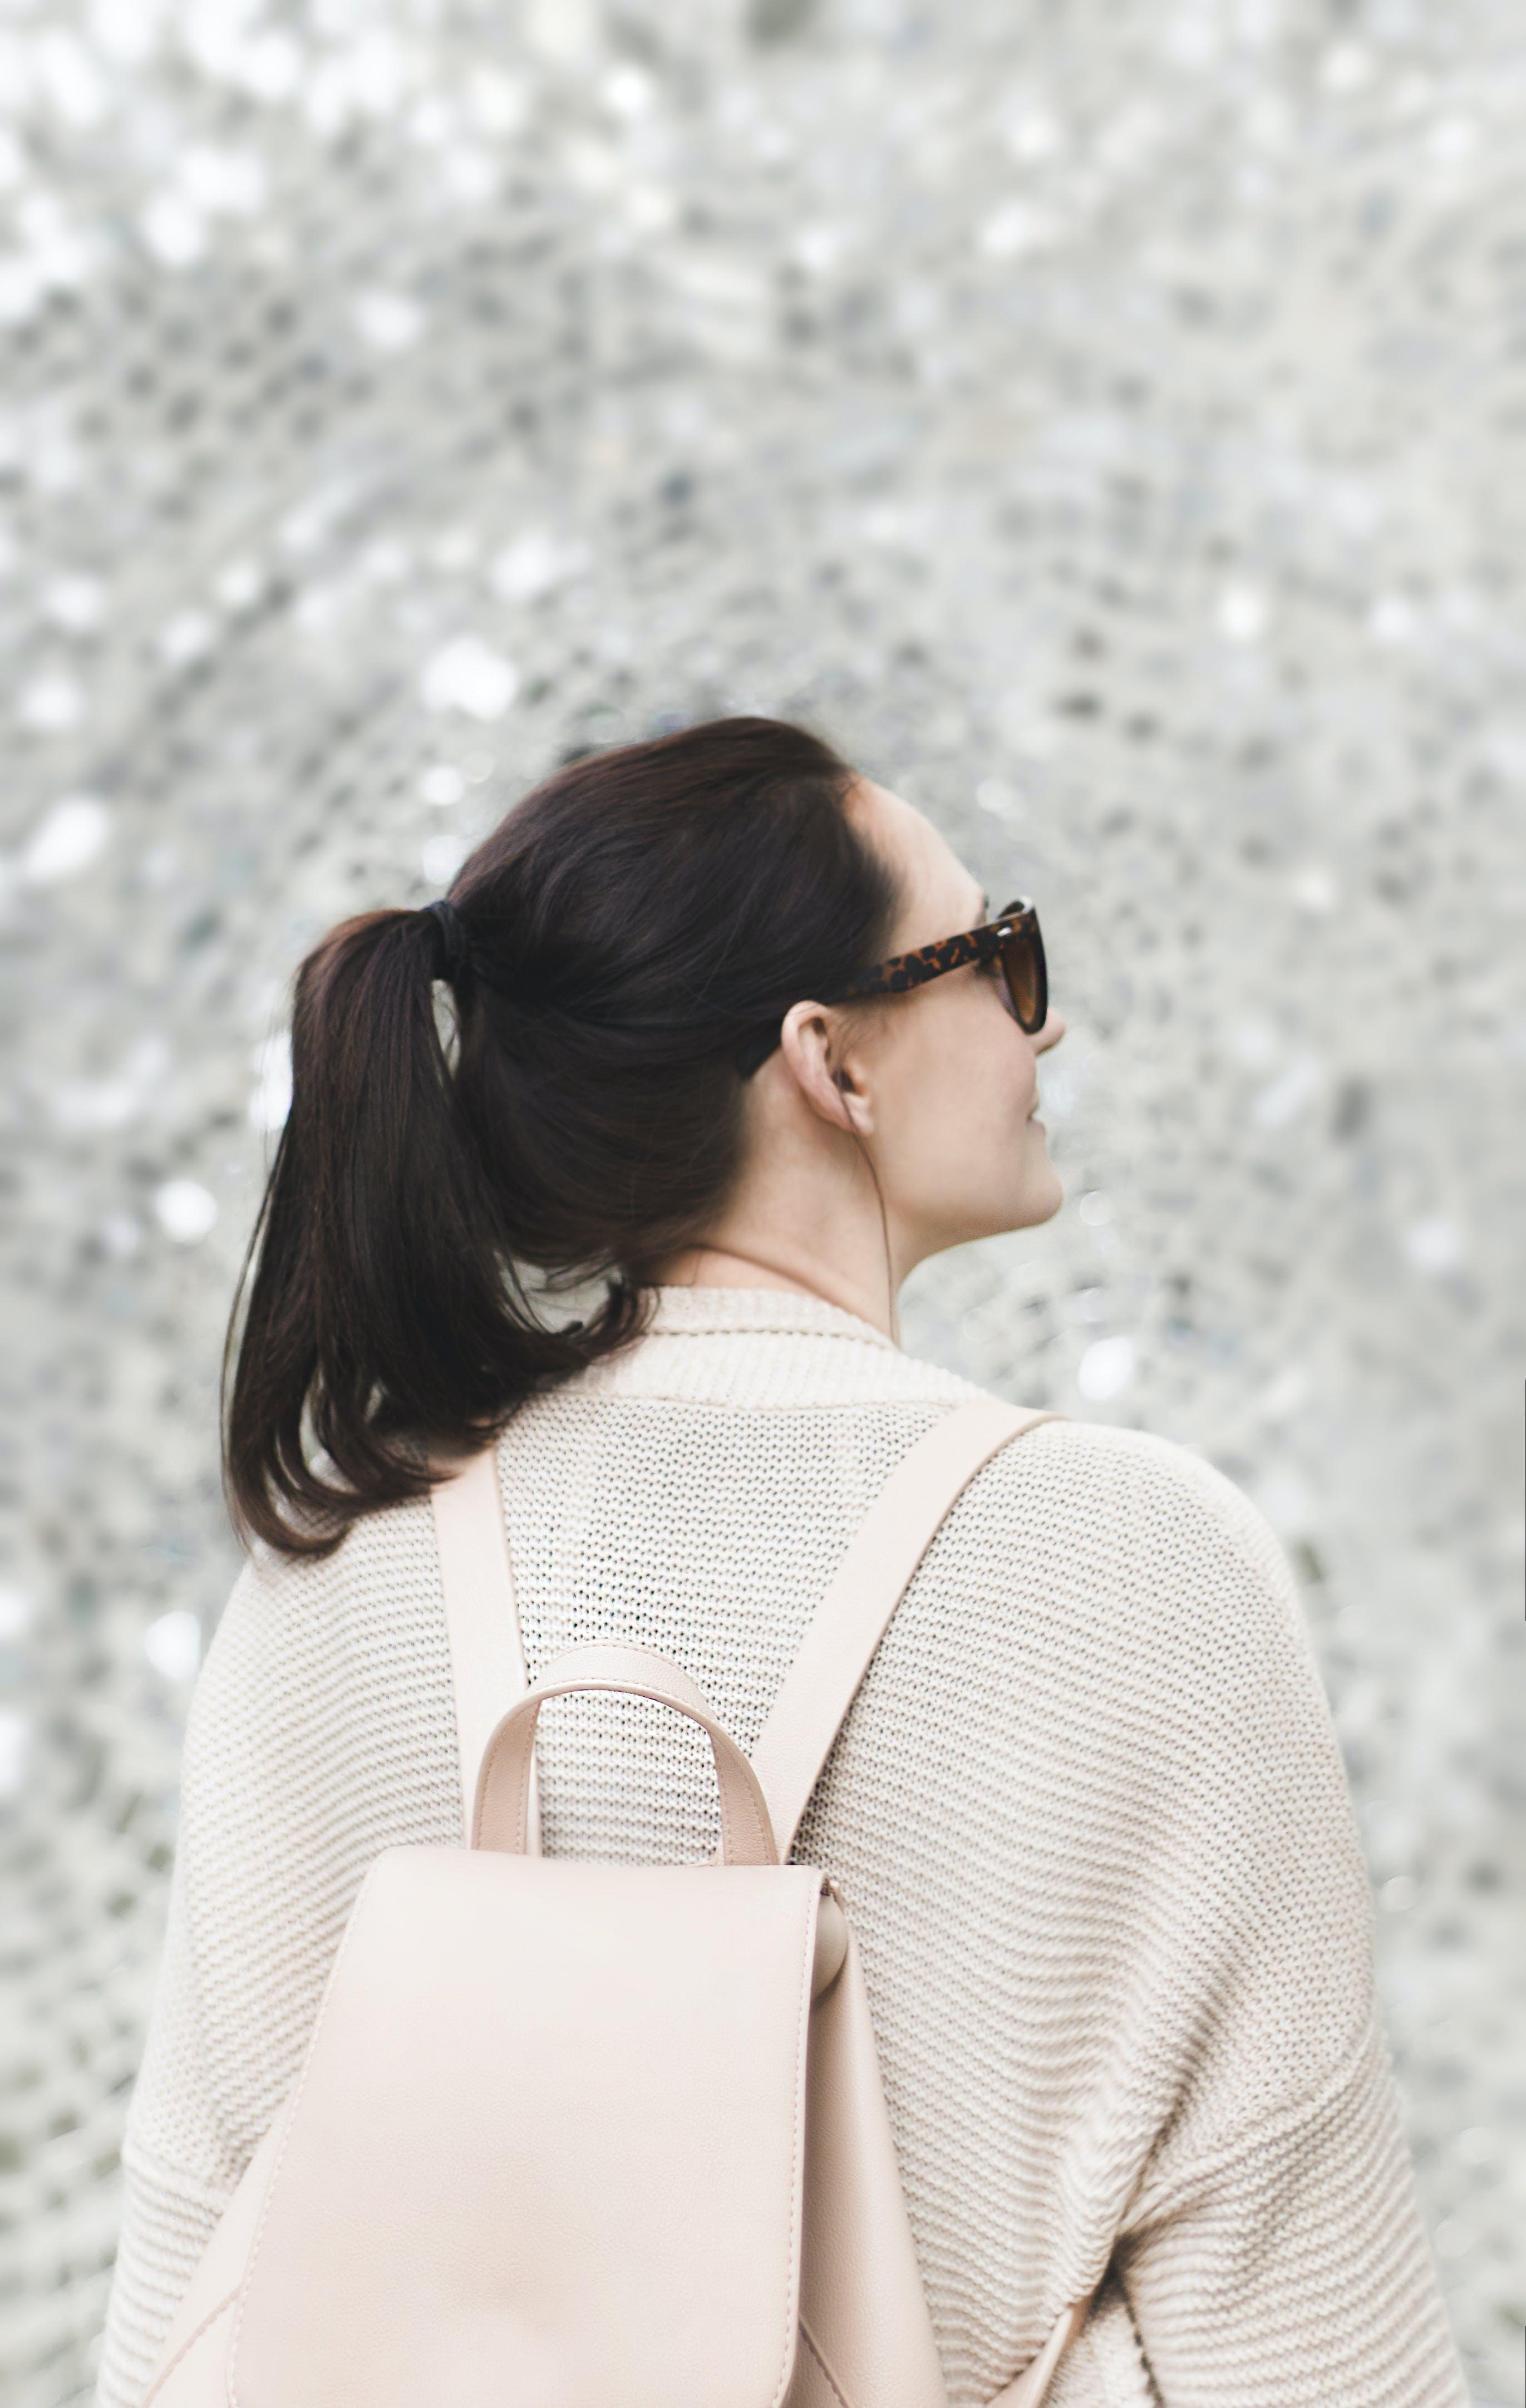 Woman Wearing White Sweatshirt and Backpack